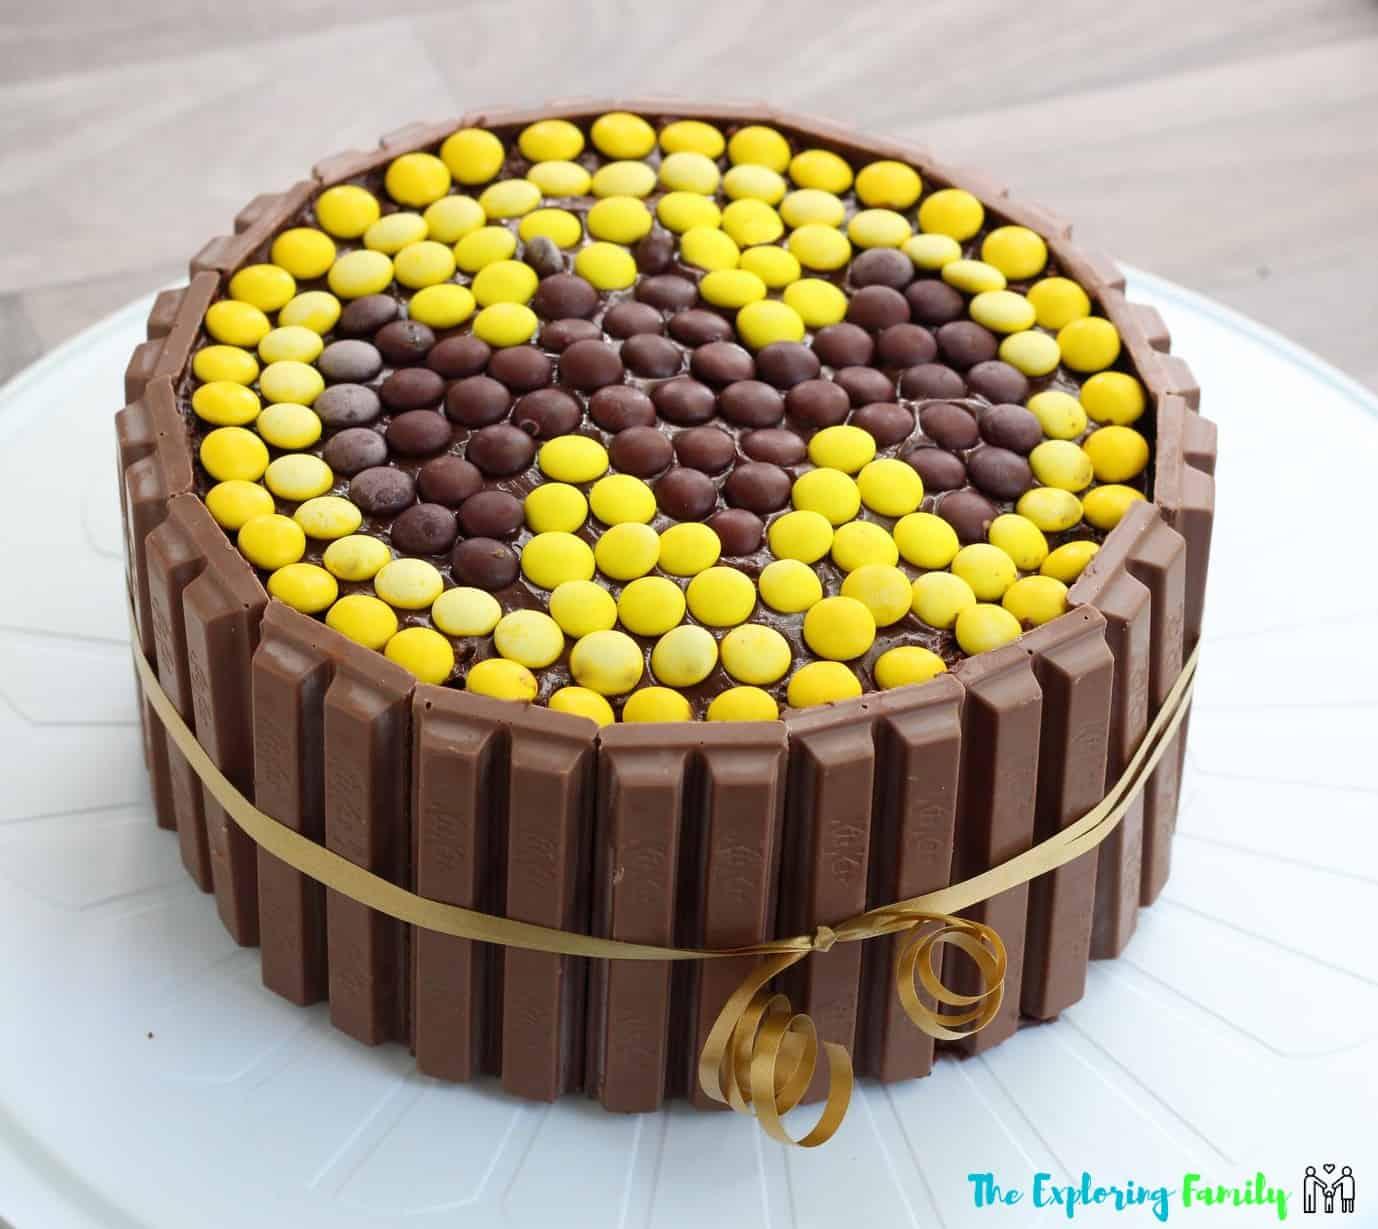 How to Make a Simple Batman Birthday Cake